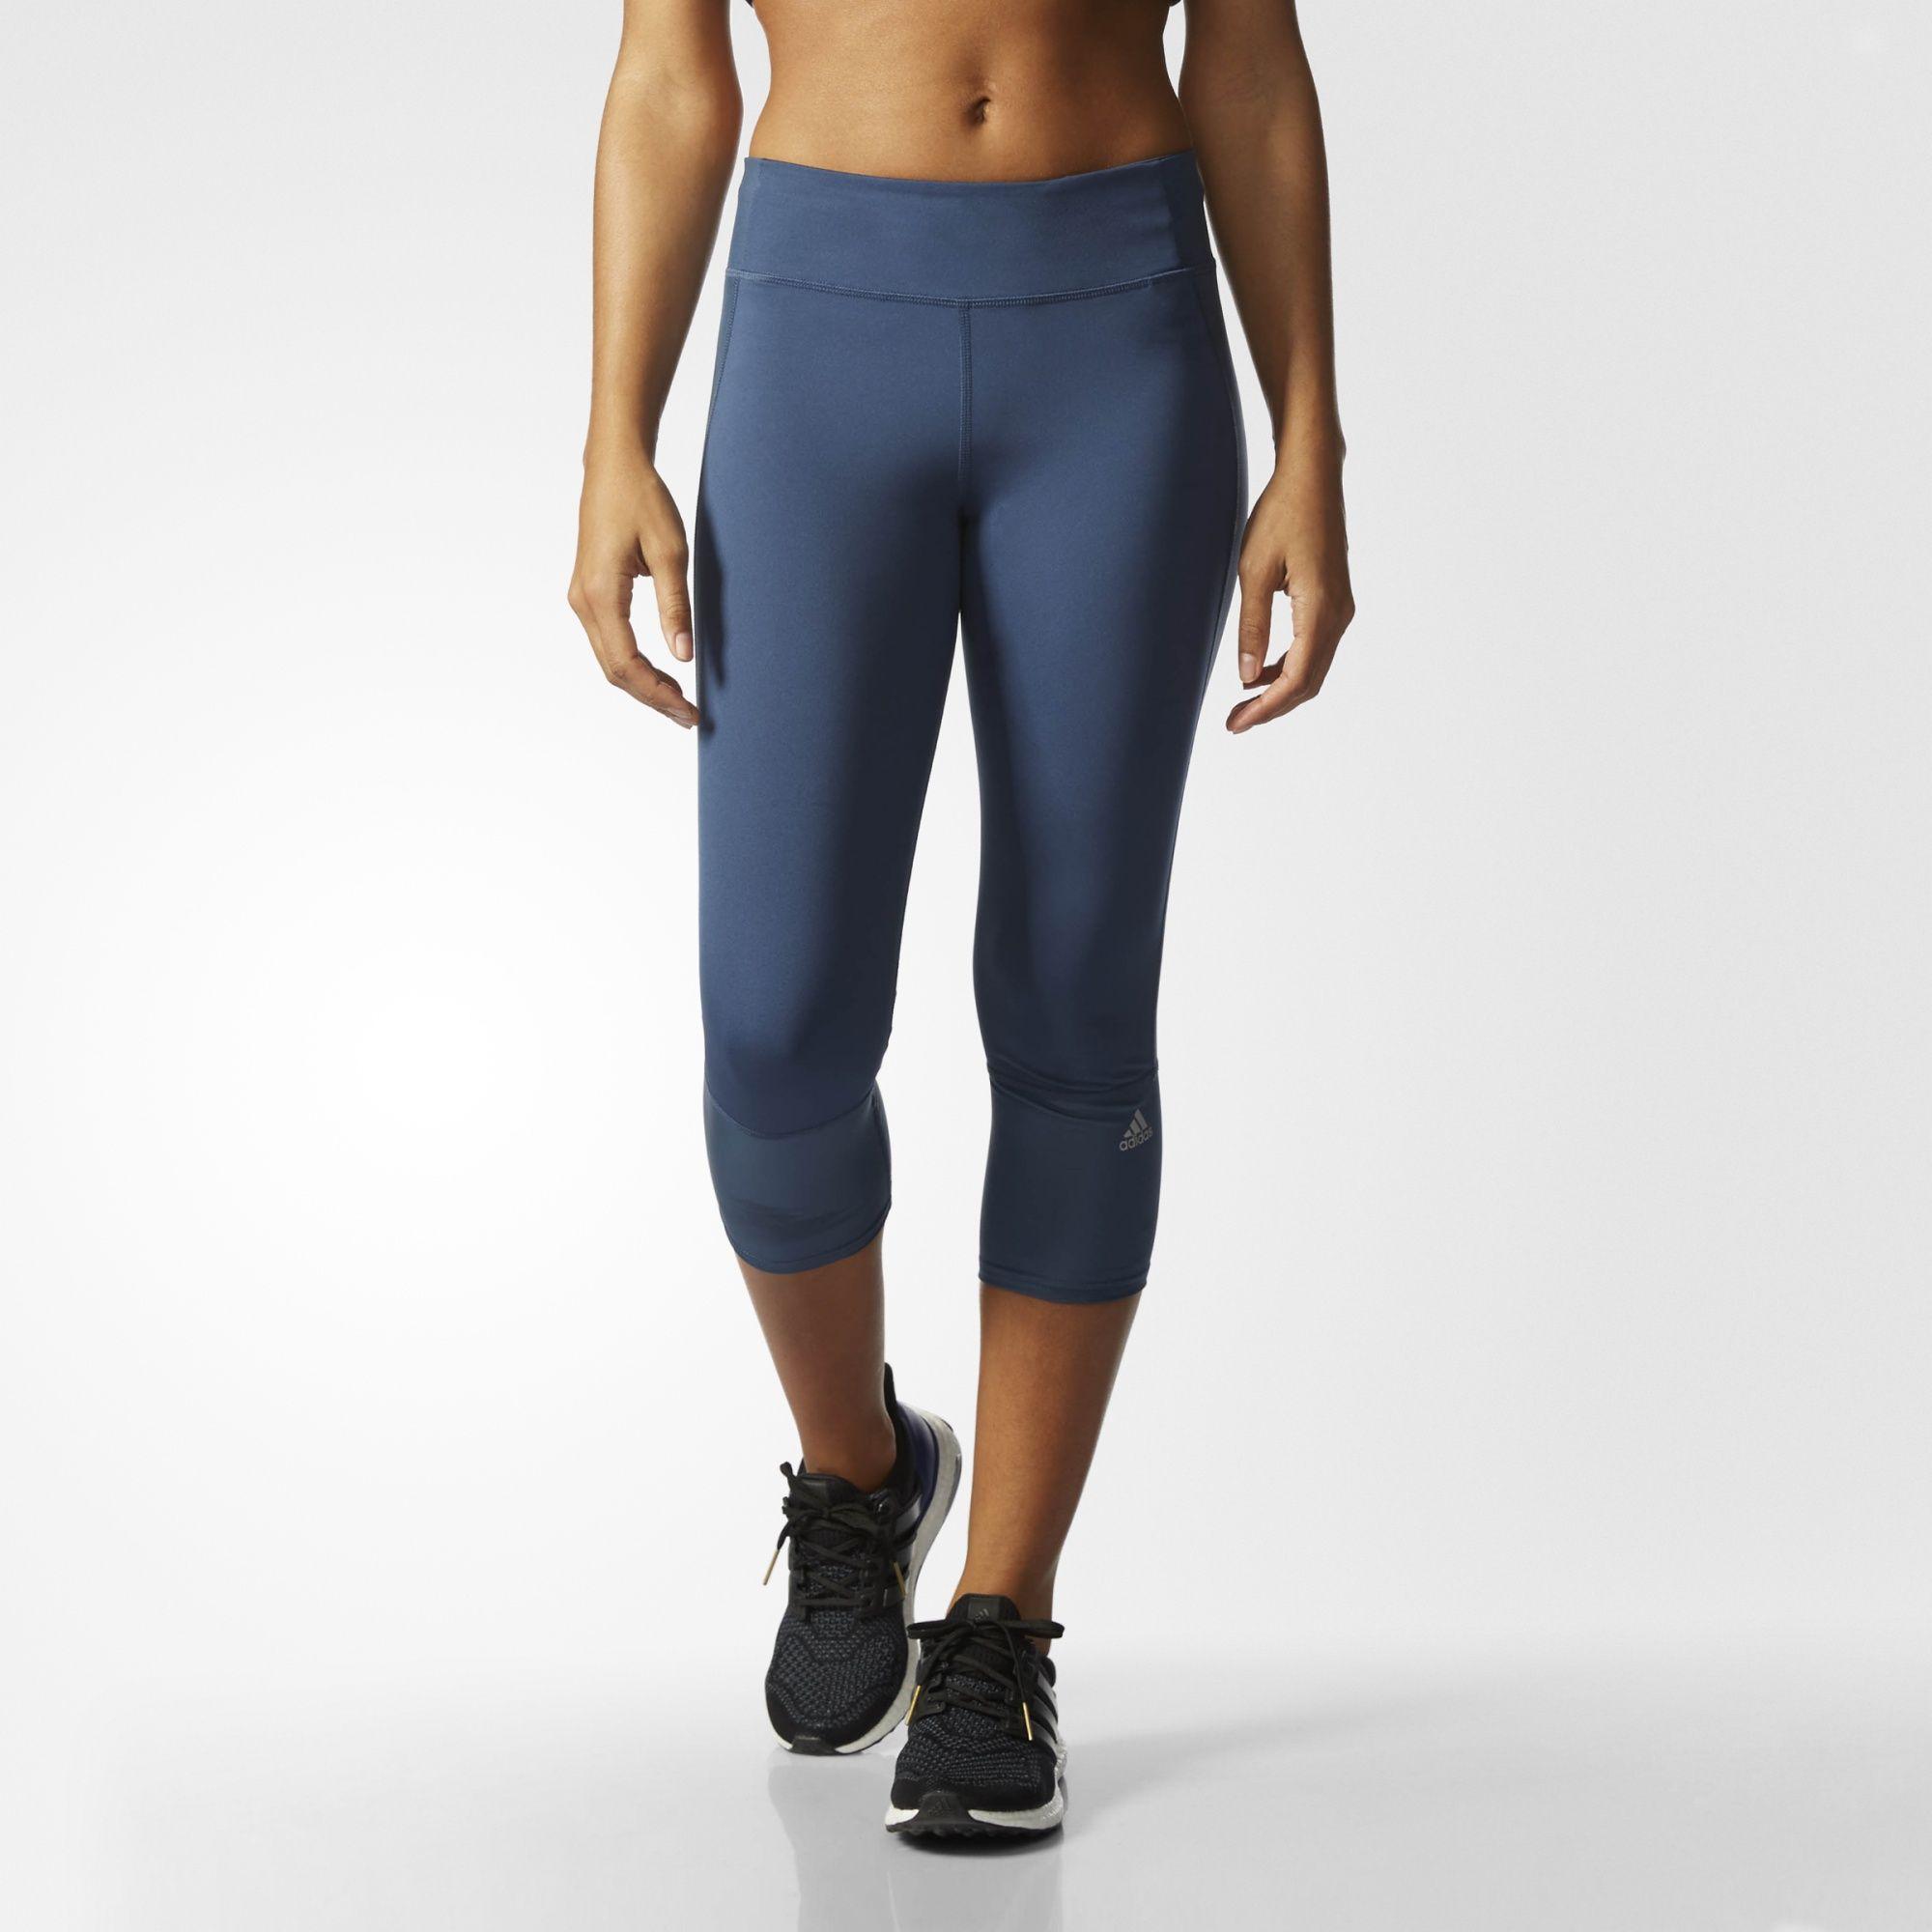 c2d7612de84c3 adidas Supernova Long Tights Sportswear for Women Shop Womens Sportswear  COLOUR-black